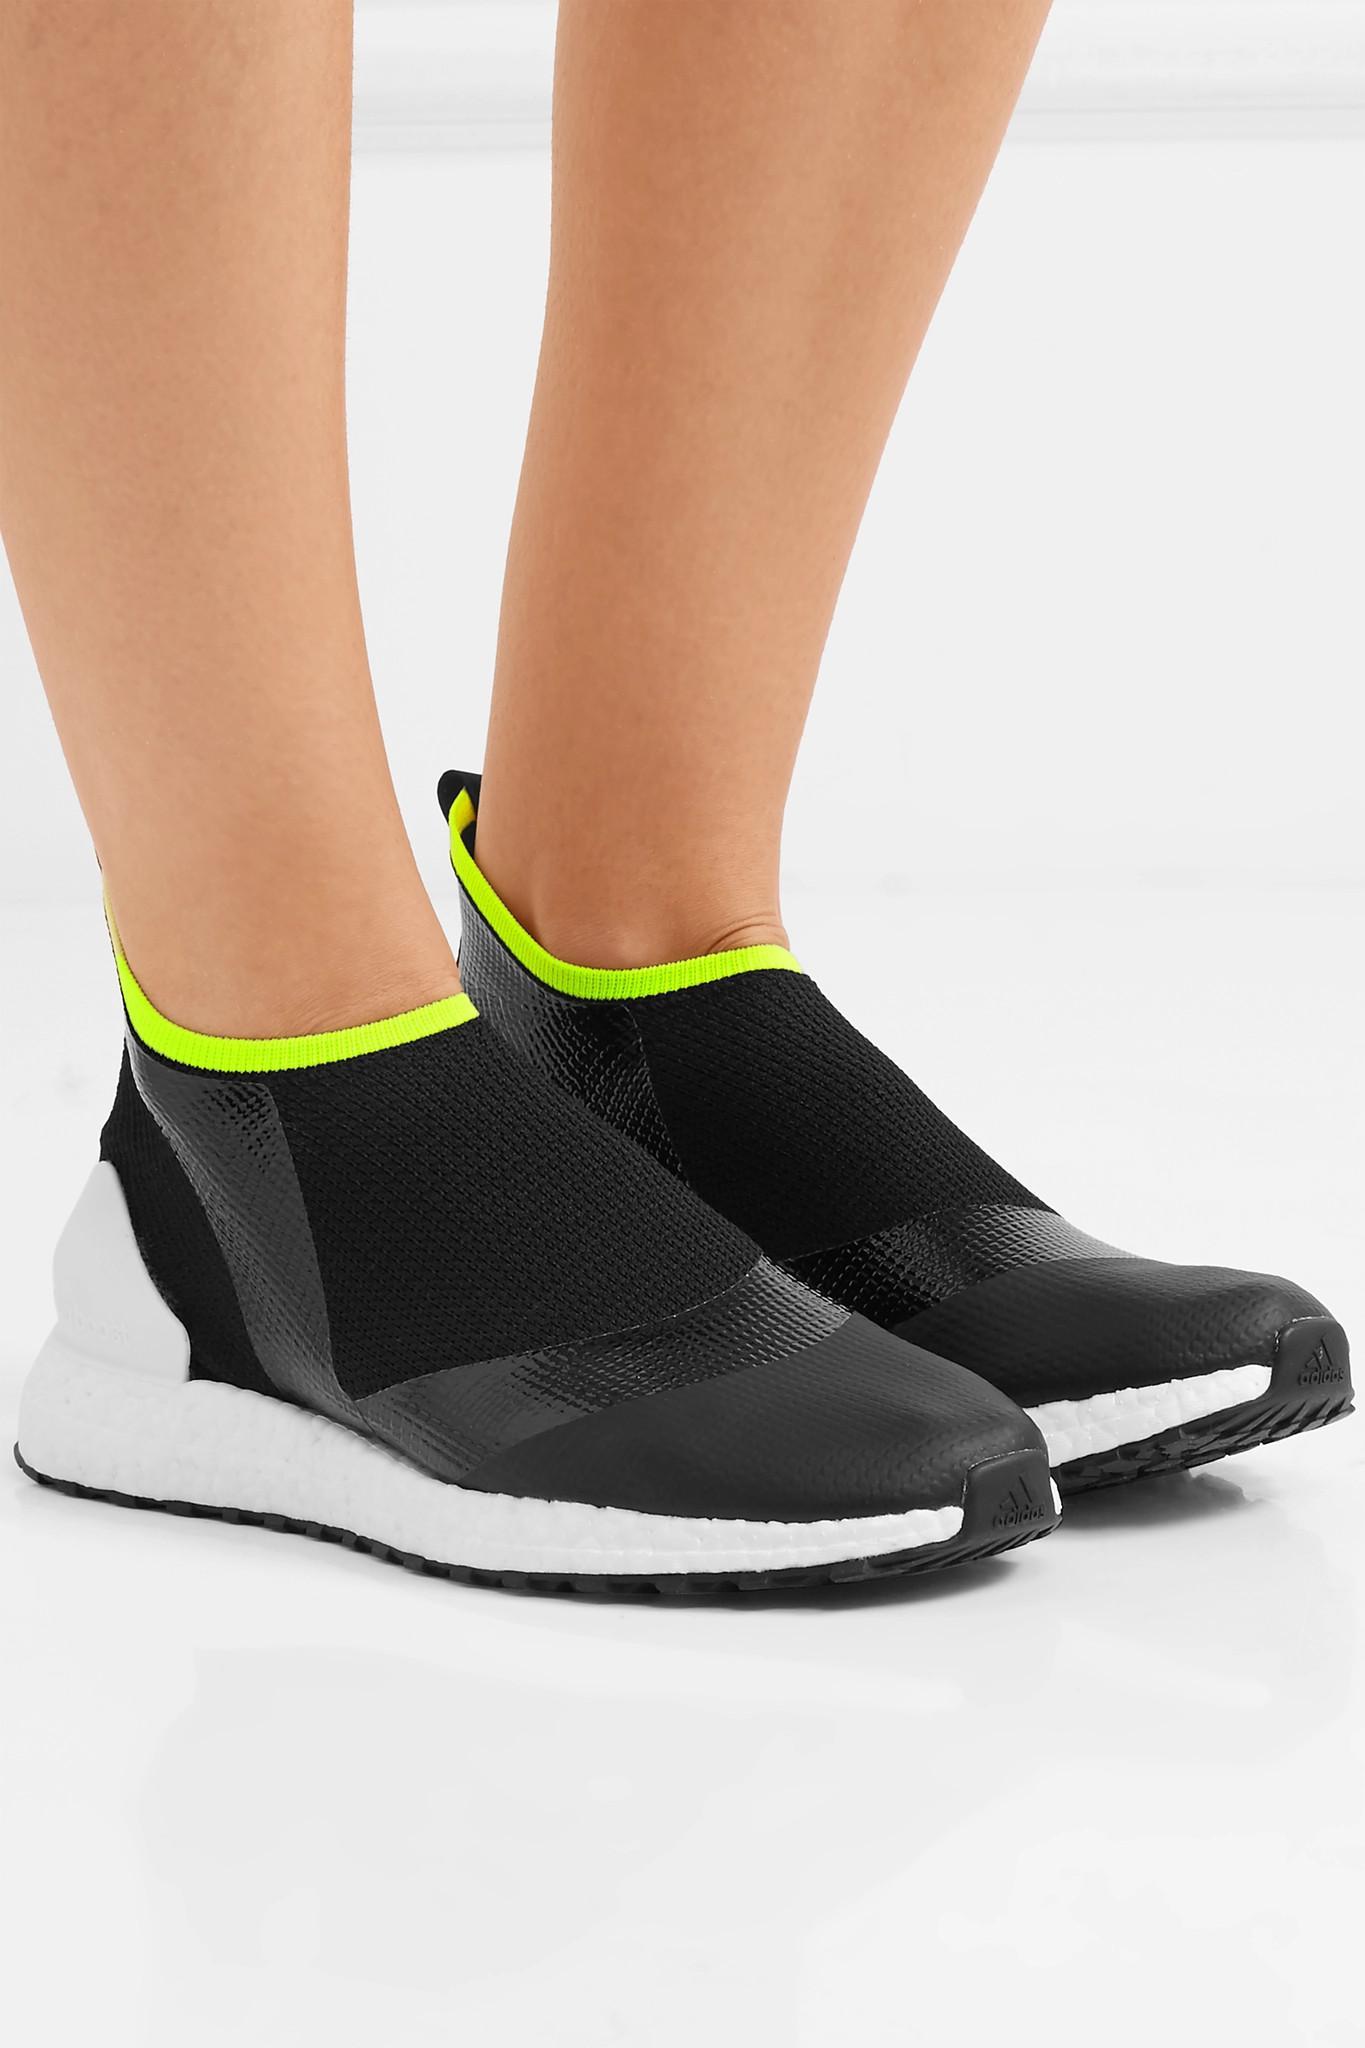 869611b7e78d Adidas By Stella McCartney - Black Ultraboost X All Terrain Sneakers -  Lyst. View fullscreen